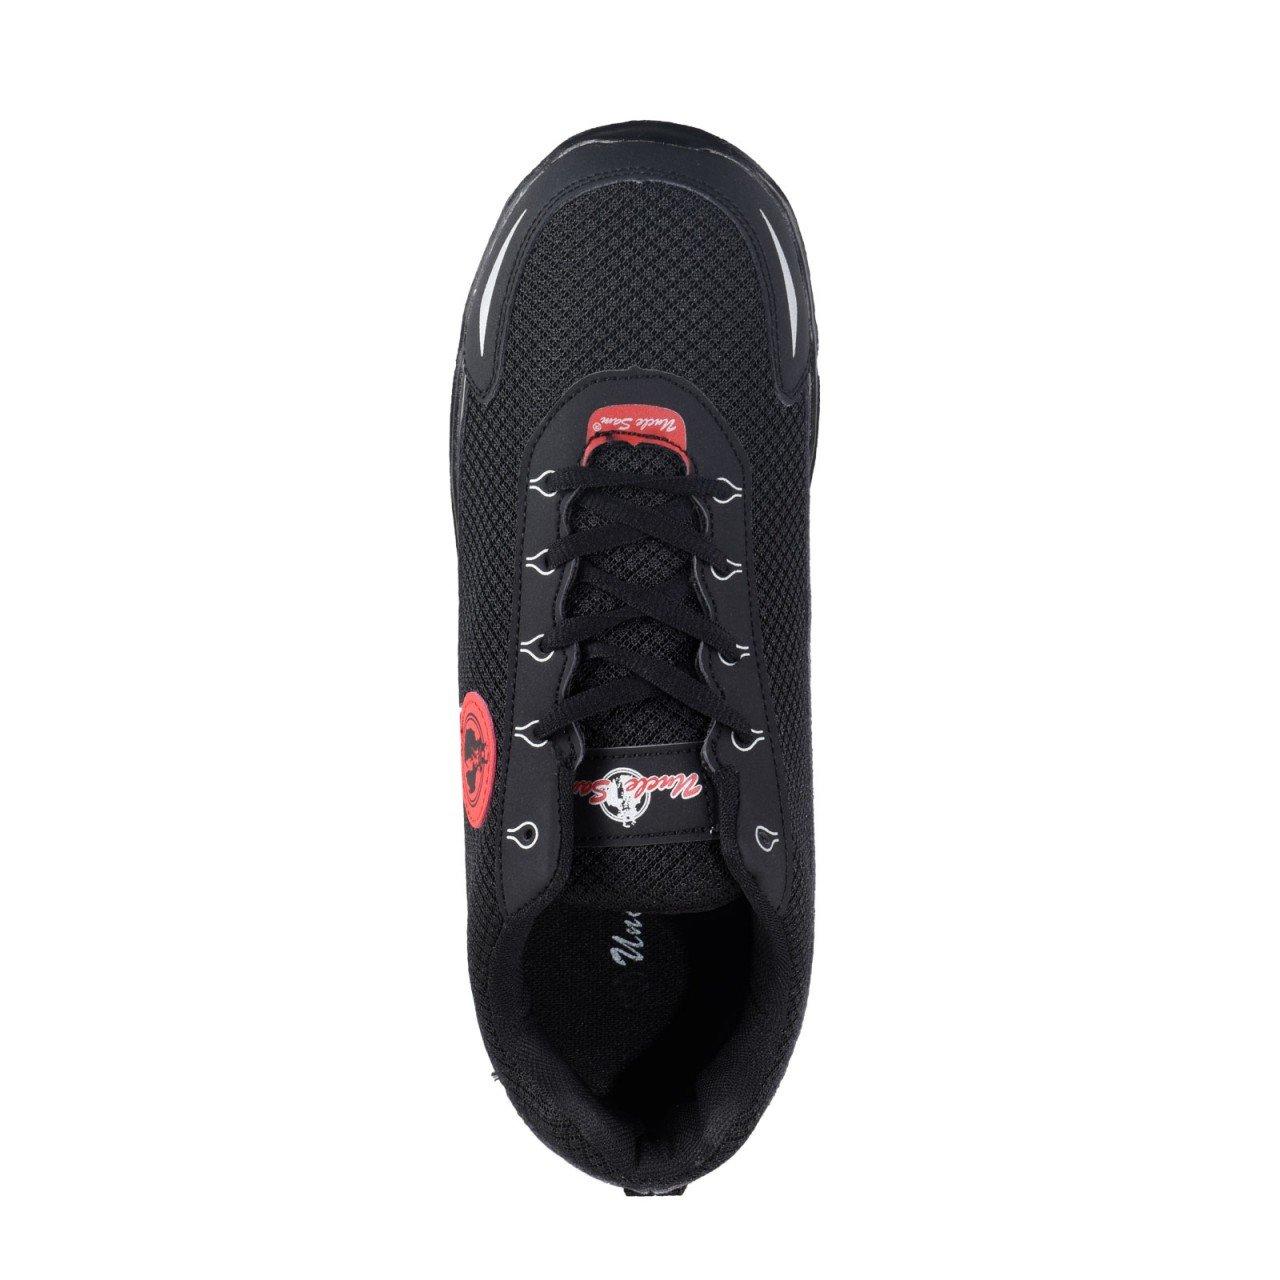 Uncle Sam Herren Leichtlaufschuhe Sneaker Sportschuhe Joggingschuhe Schwarz//Rot